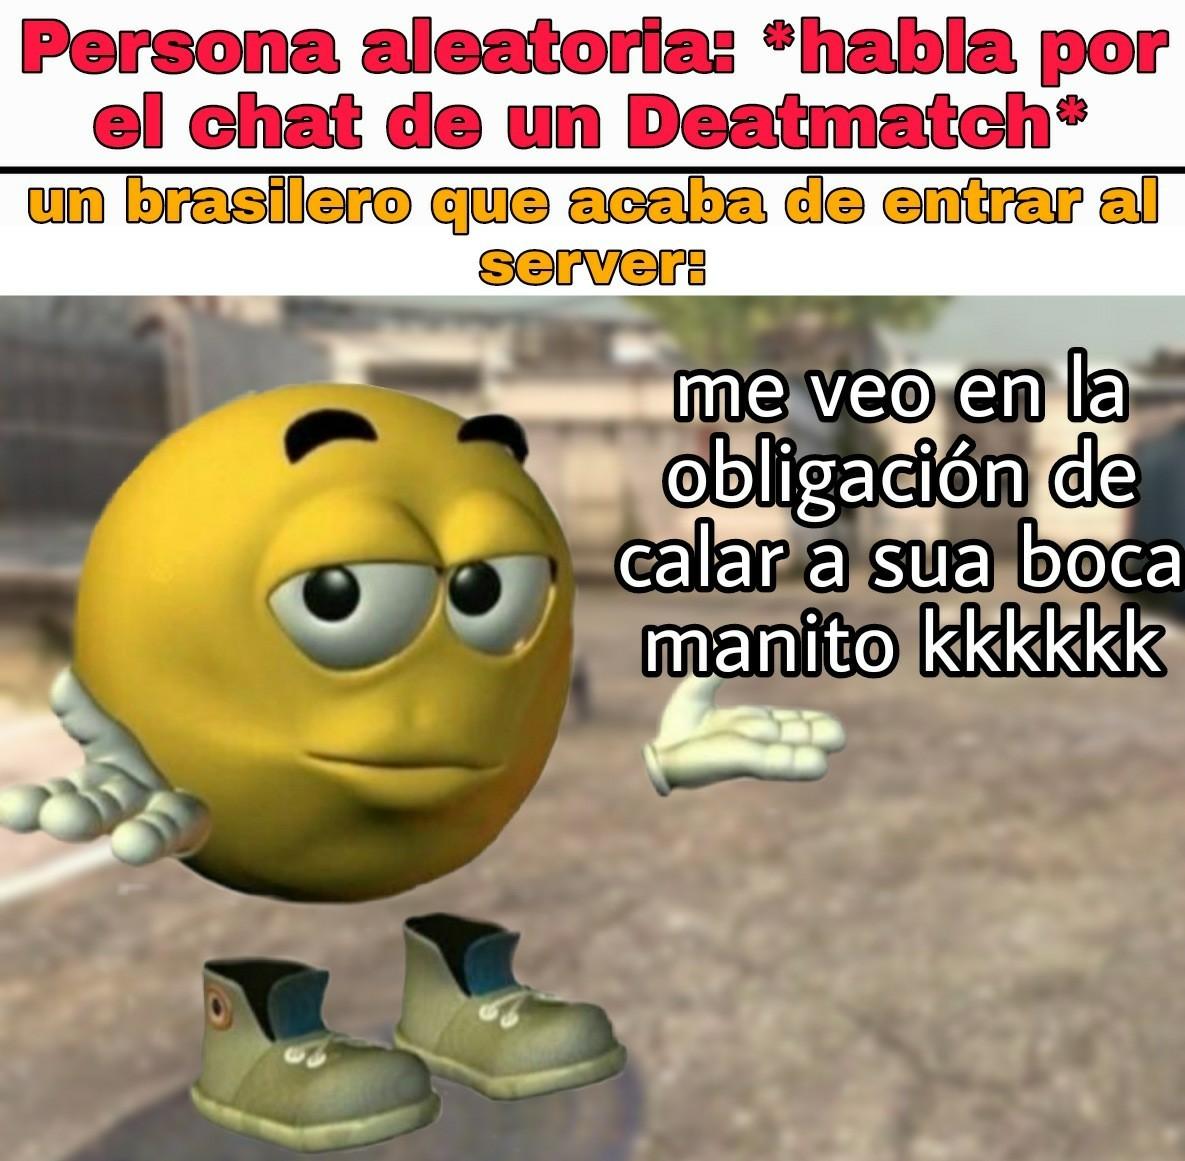 CALA BOCA MANITO - meme